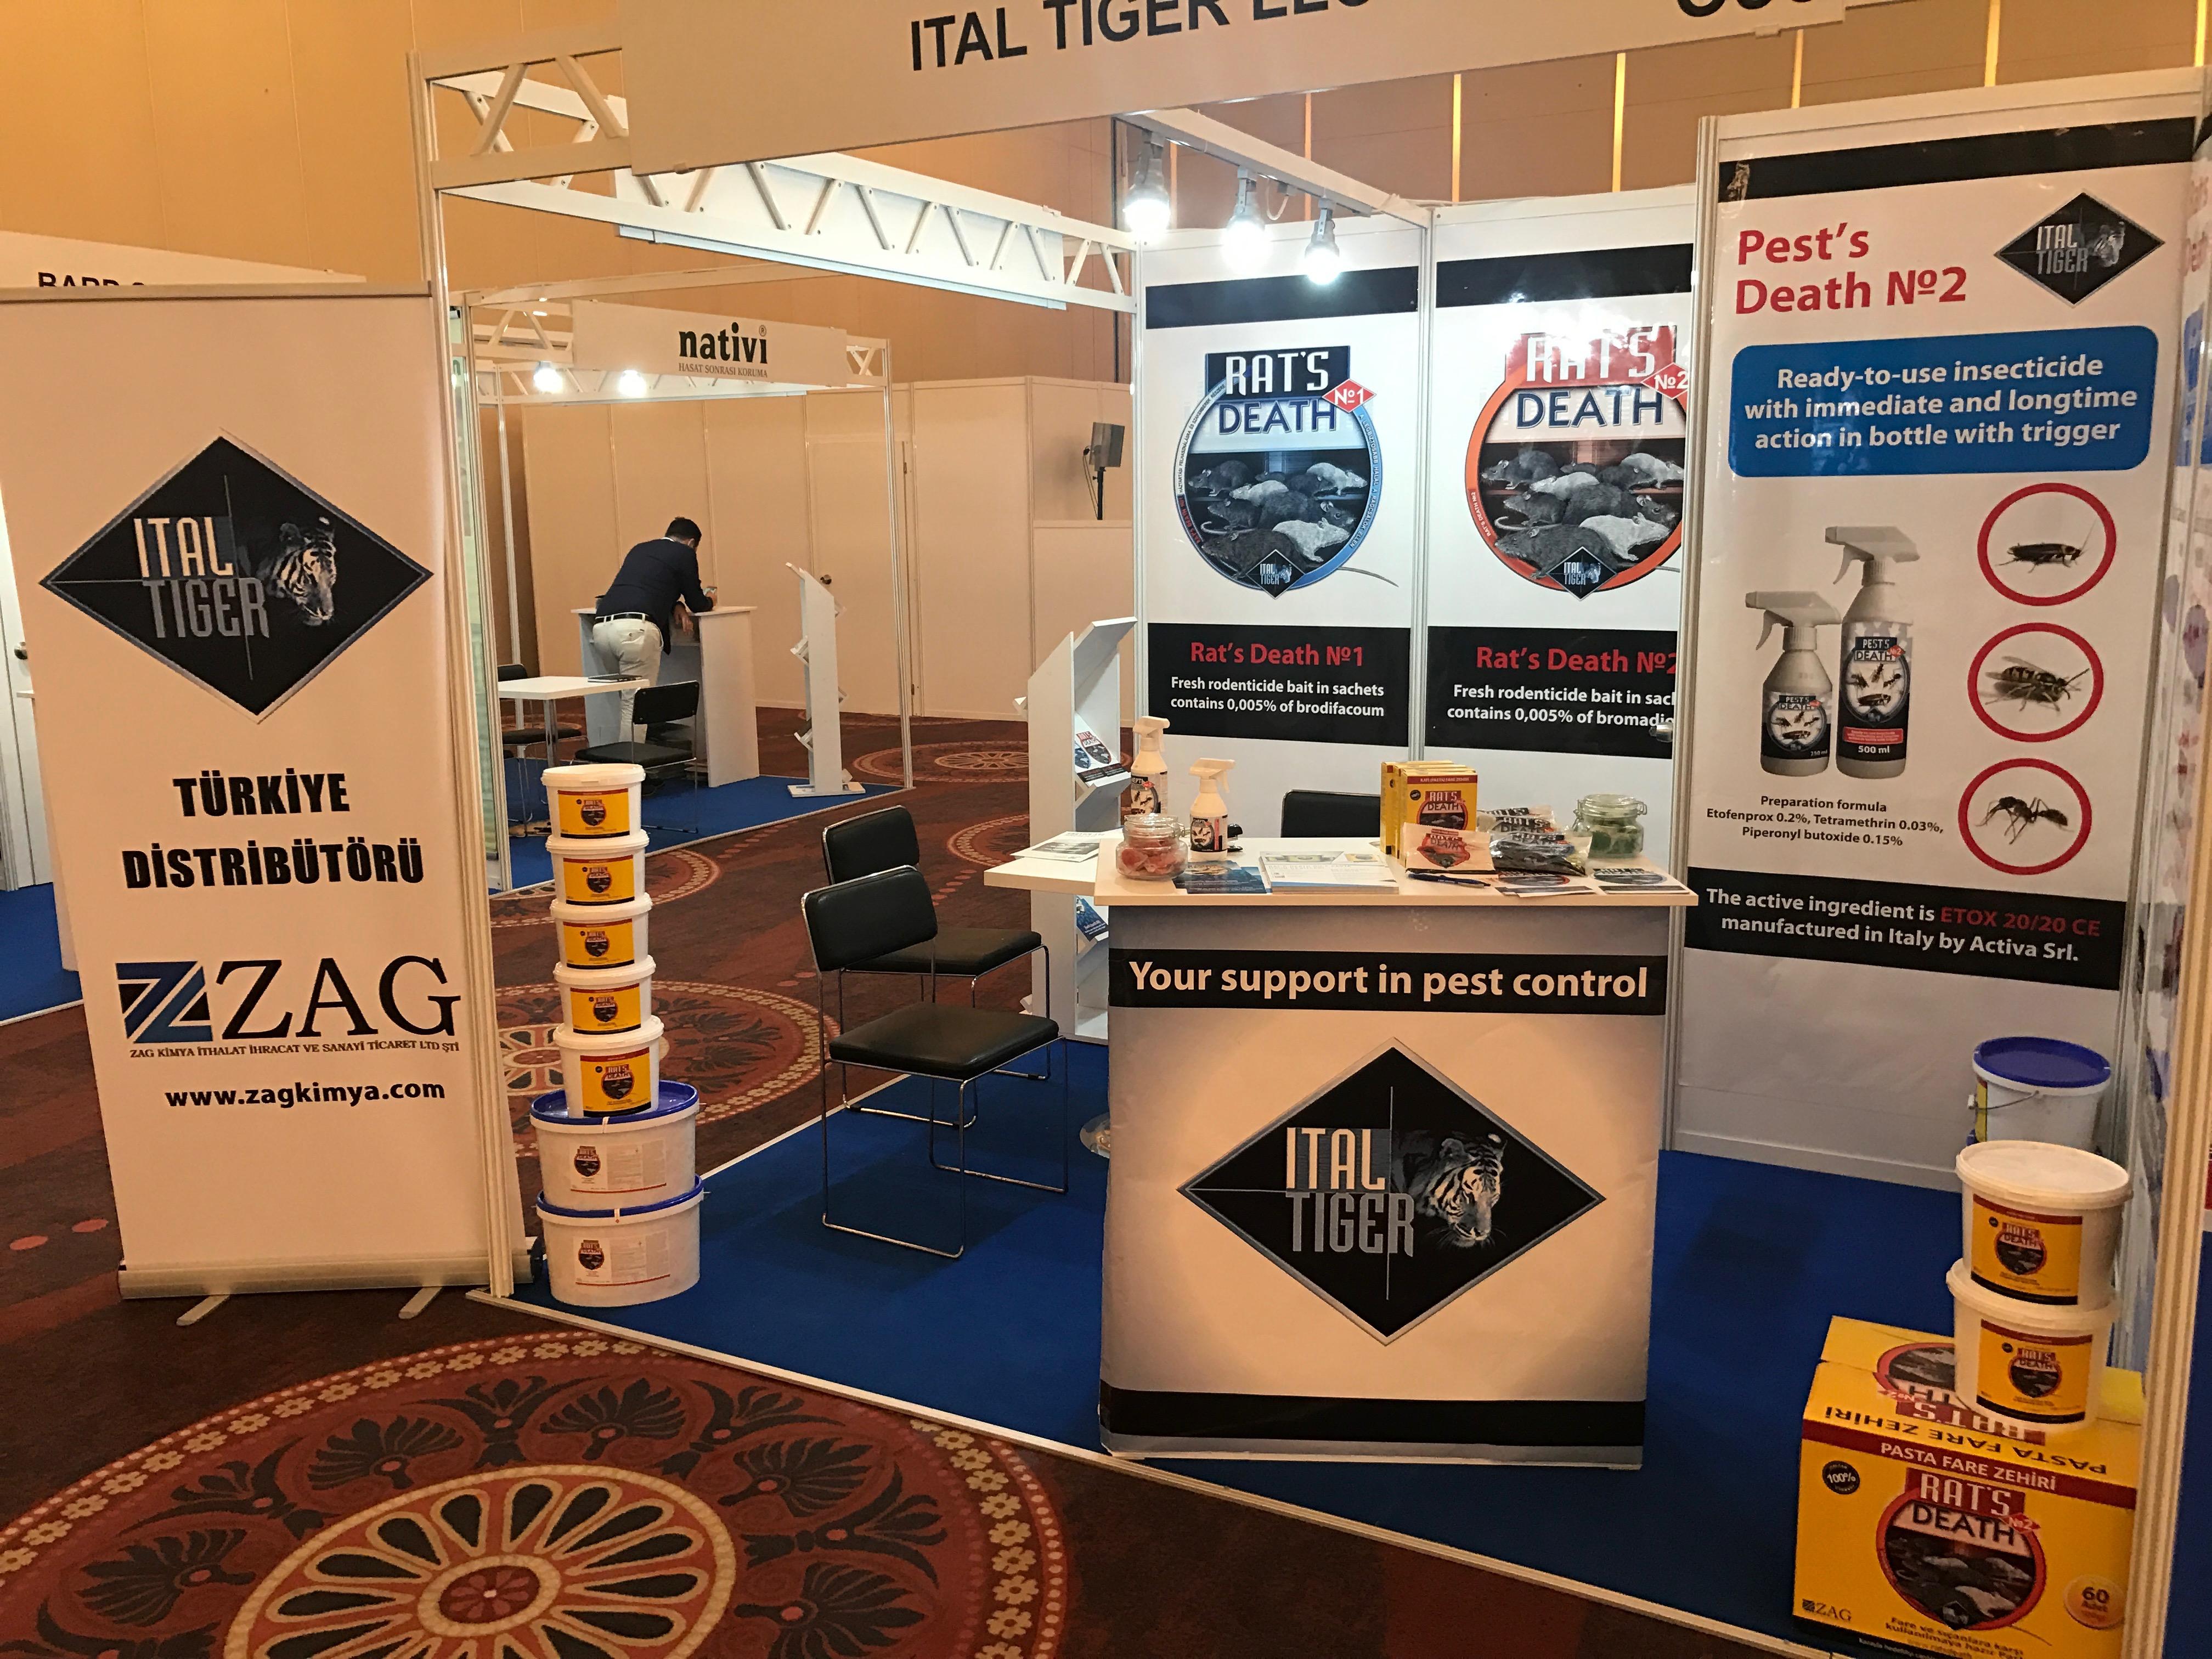 International pest control exhibition Parasitec 2017 in Istanbul